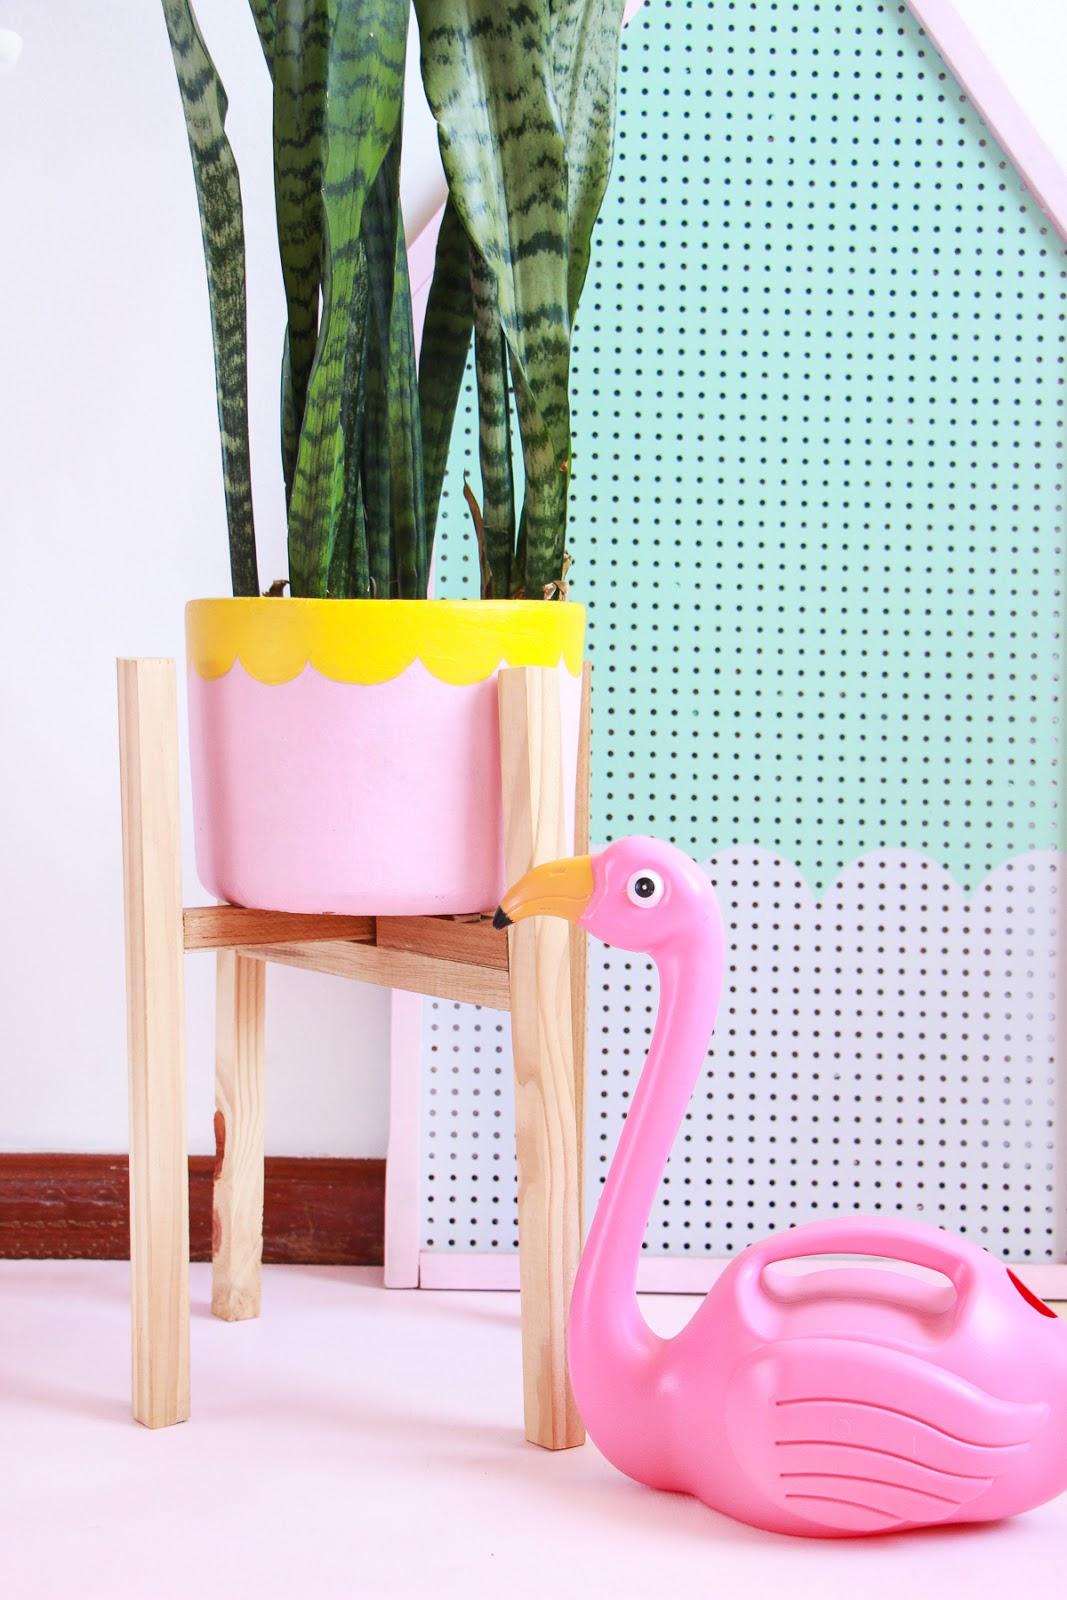 suporte para vaso de plantas de madeira DIY faca voce mesmo